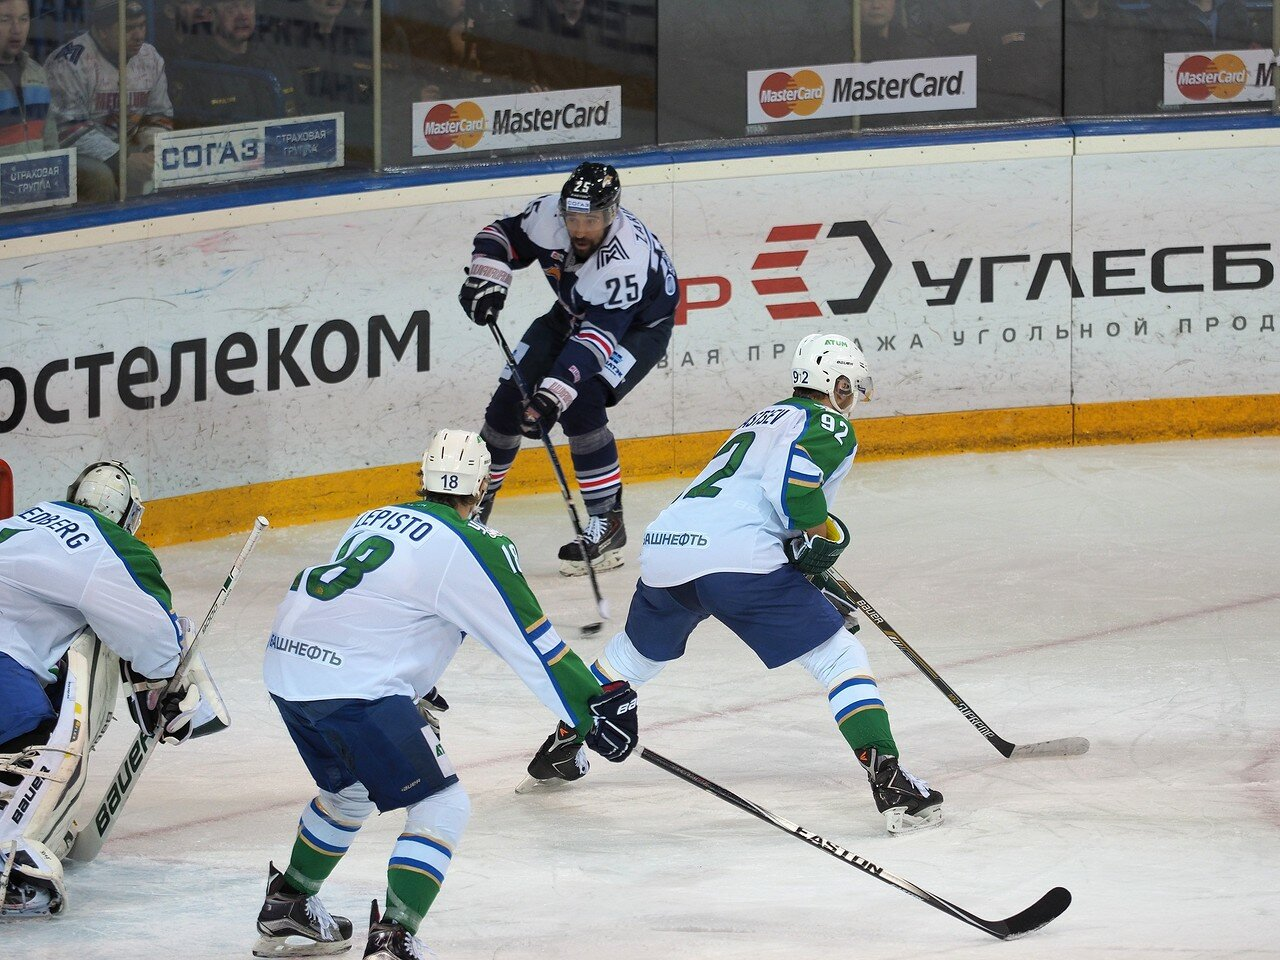 80Плей-офф 2016 Восток Финал Металлург - Салават Юлаев 23.03.2016